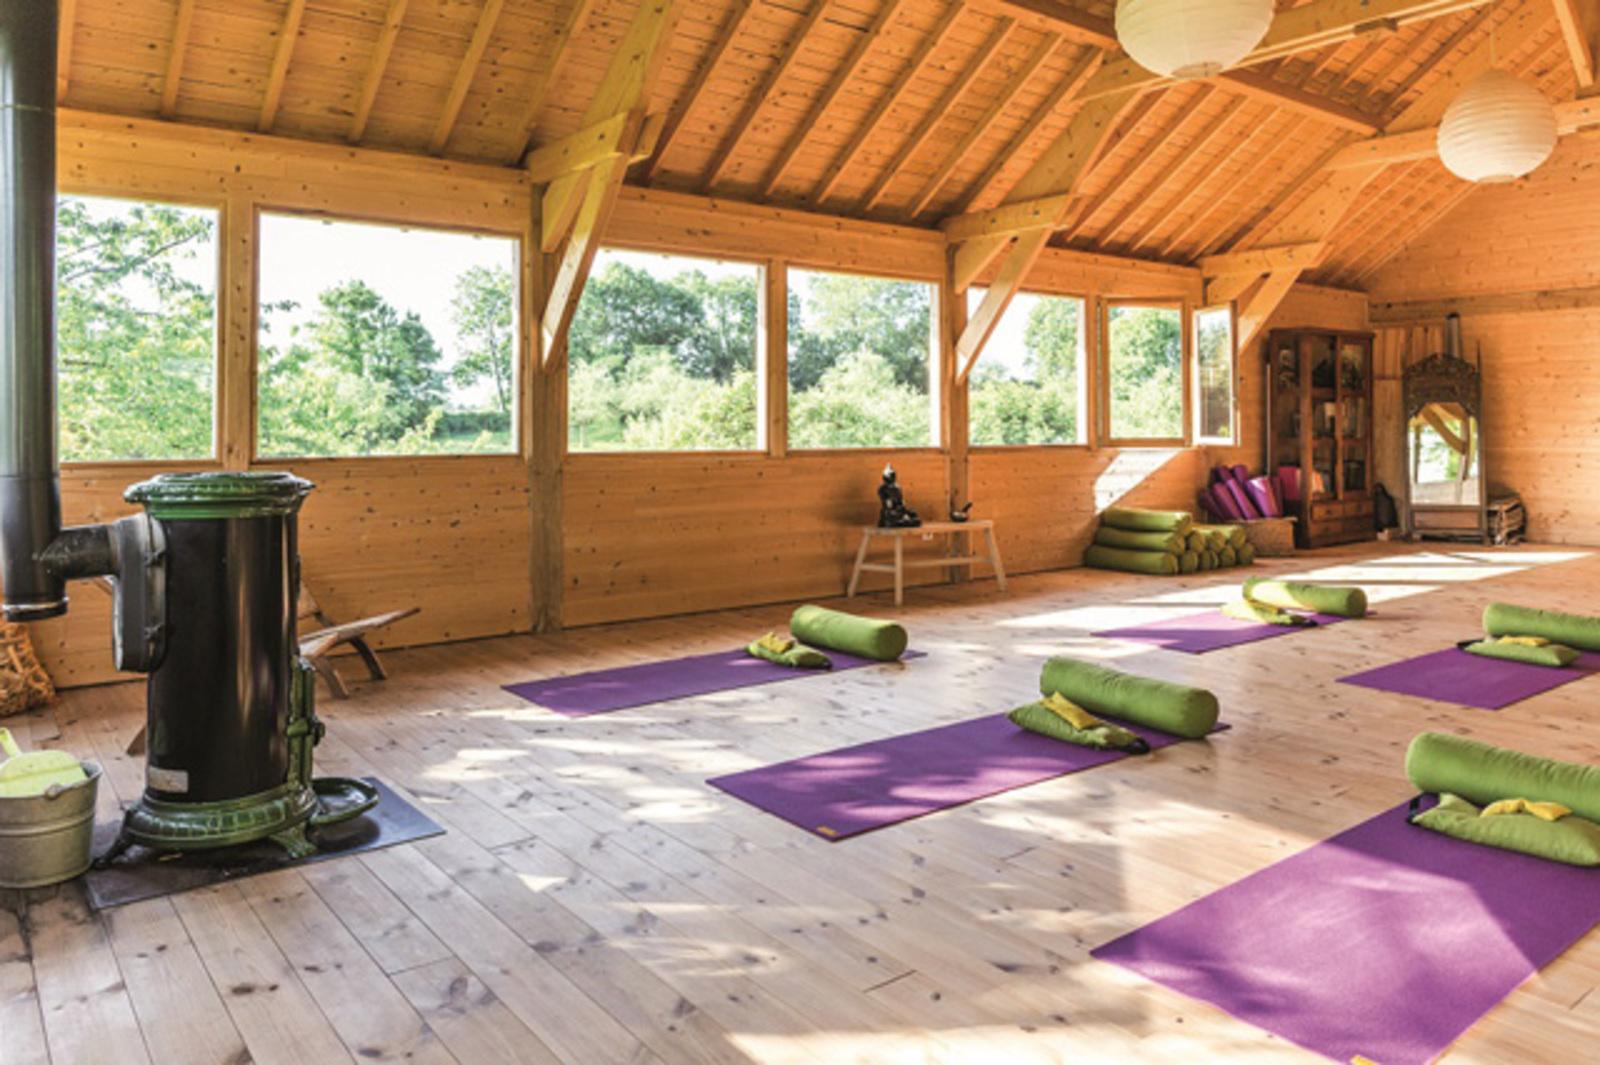 Yoga & detox après les fêtes - Regarde Le Ciel